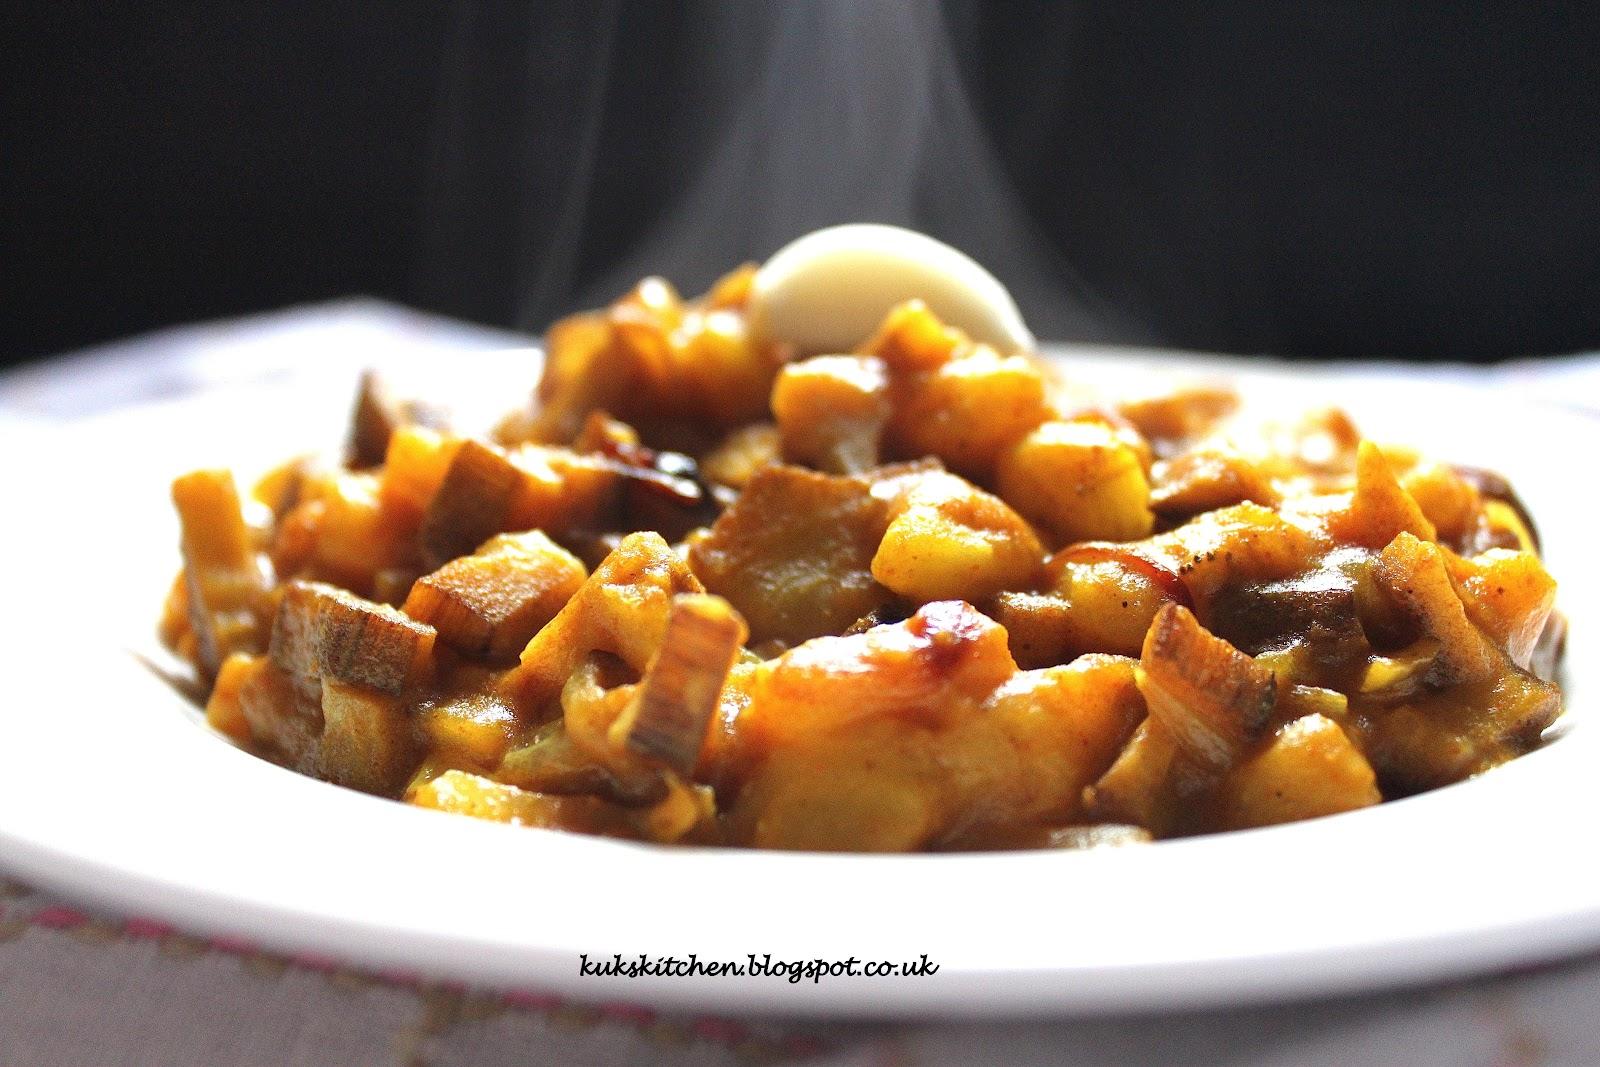 Kuks kitchen easy kerala malayali syrian christian recipes indian pin it forumfinder Choice Image